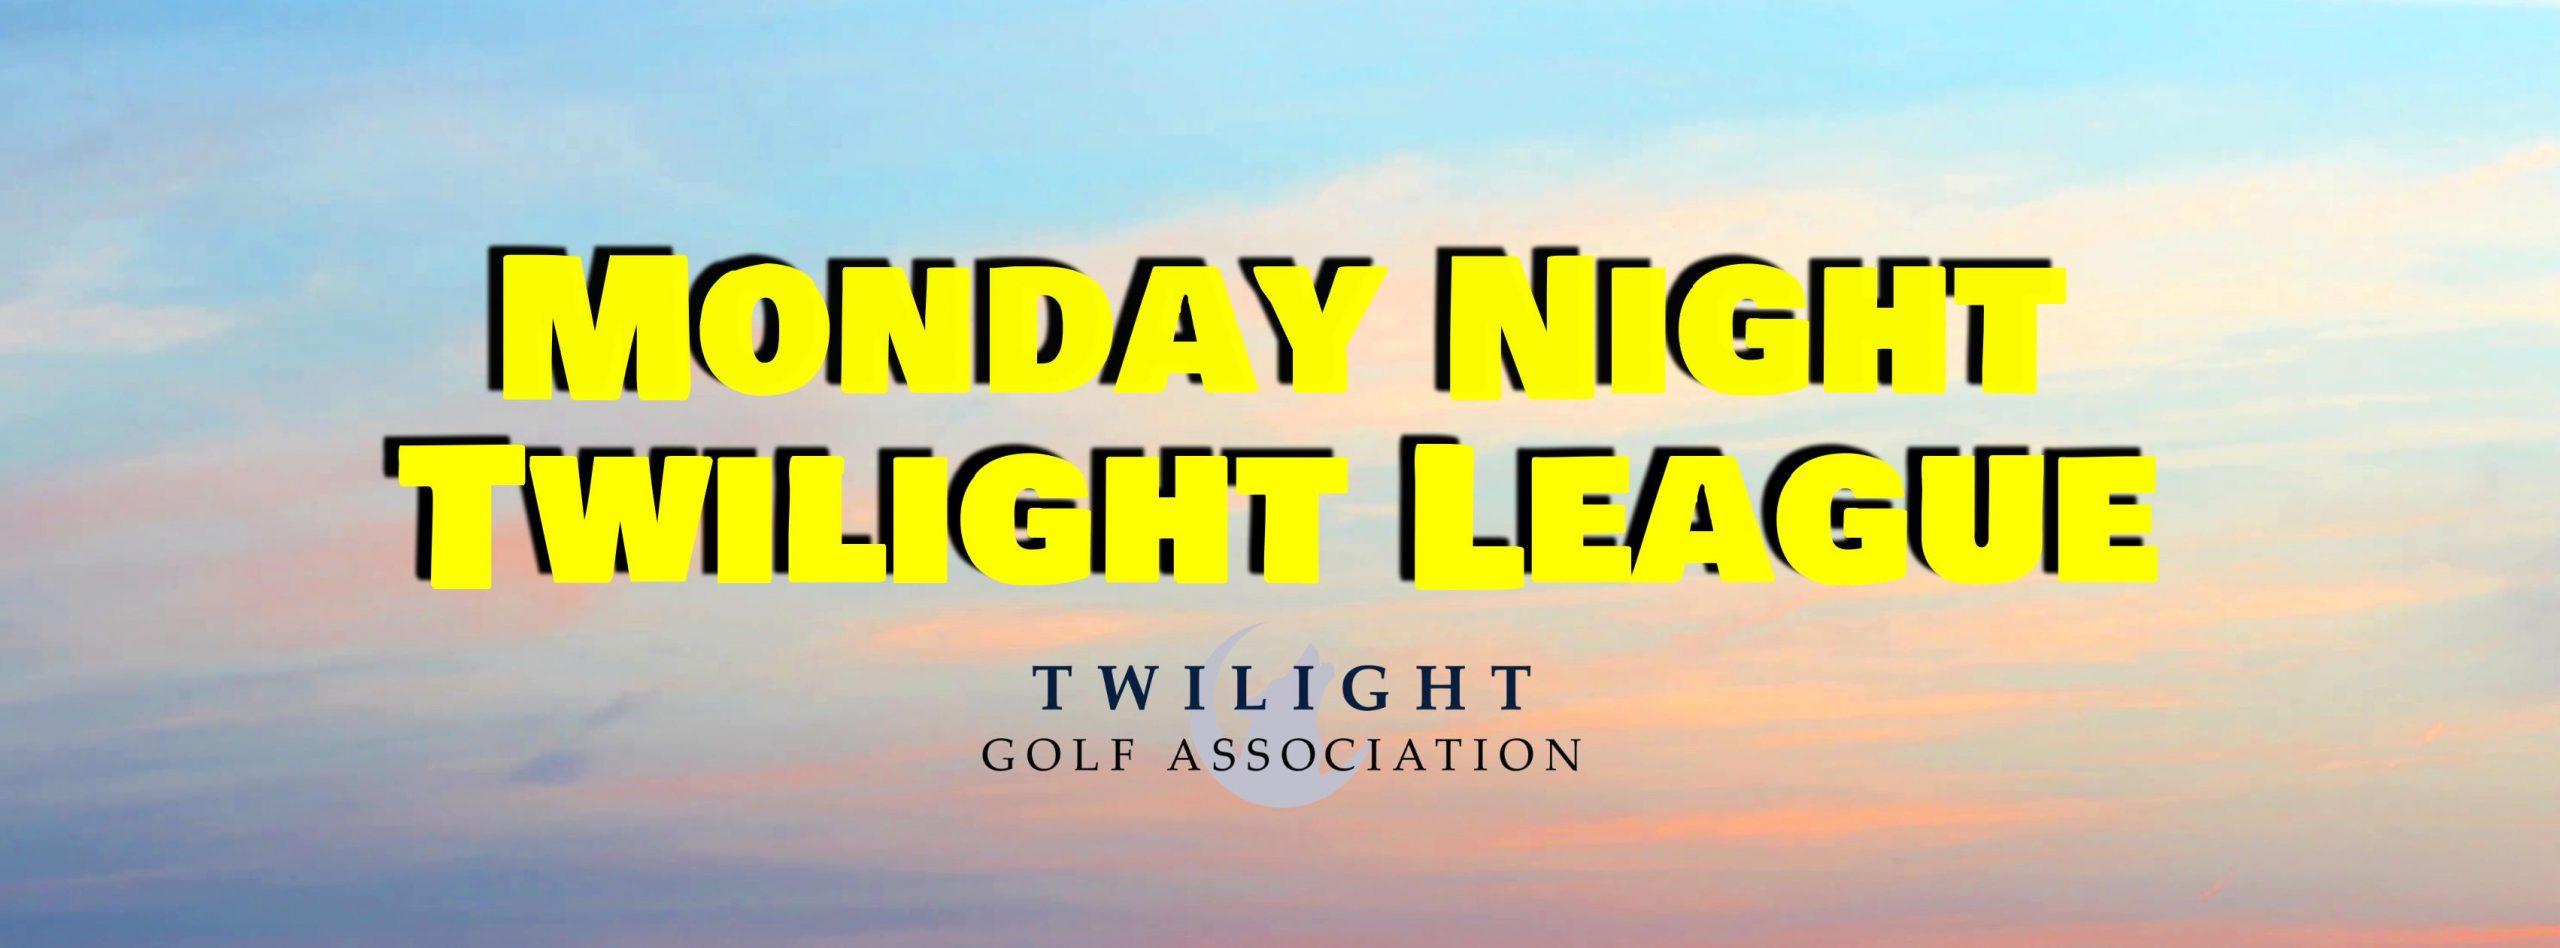 Monday Night Twilight League at Bellair Golf Club